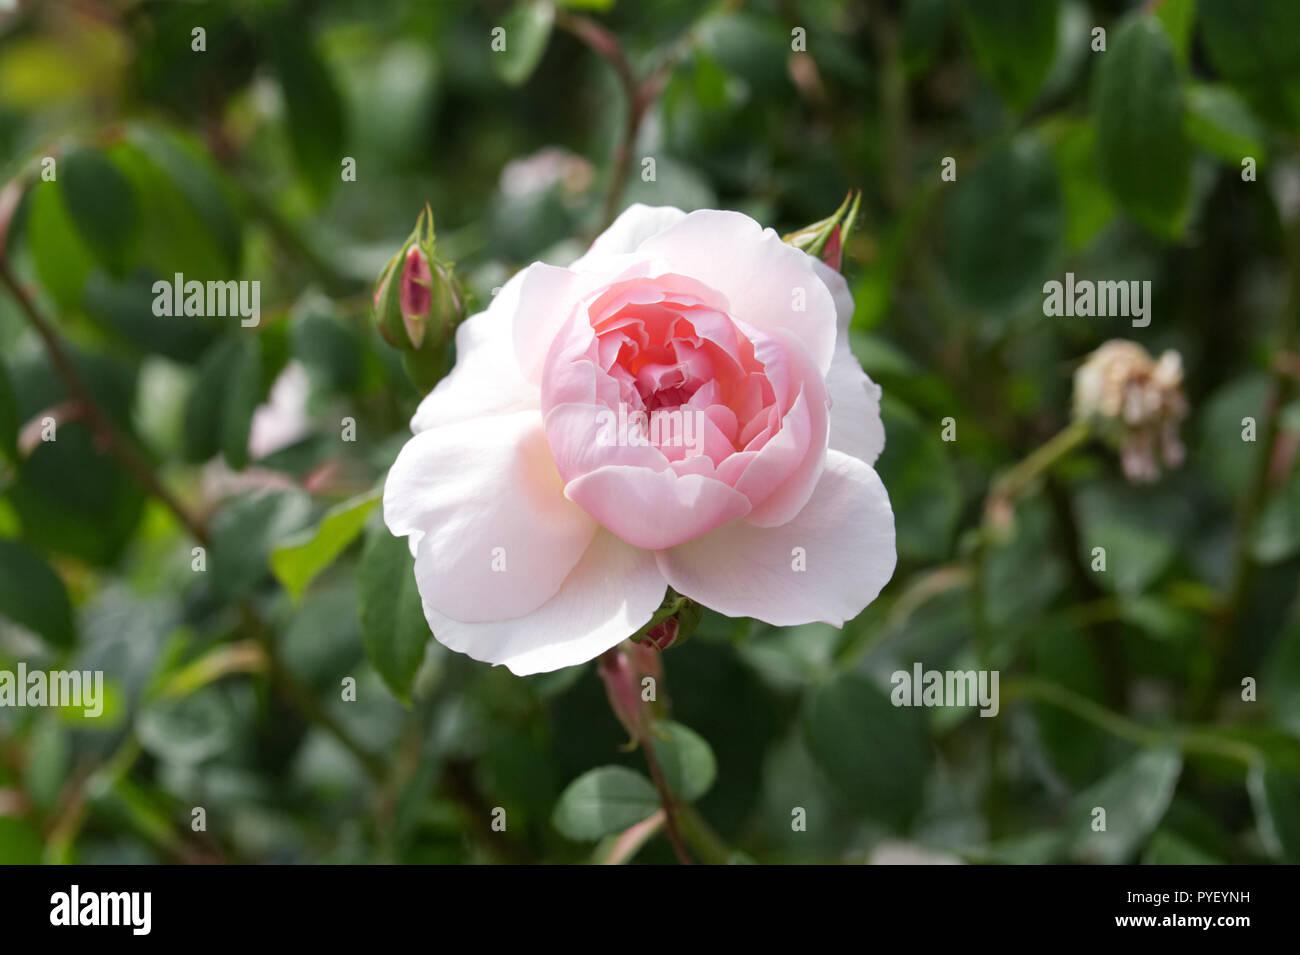 Rosa 'The Generous Gardener Ausdrawn' fleurs. Photo Stock